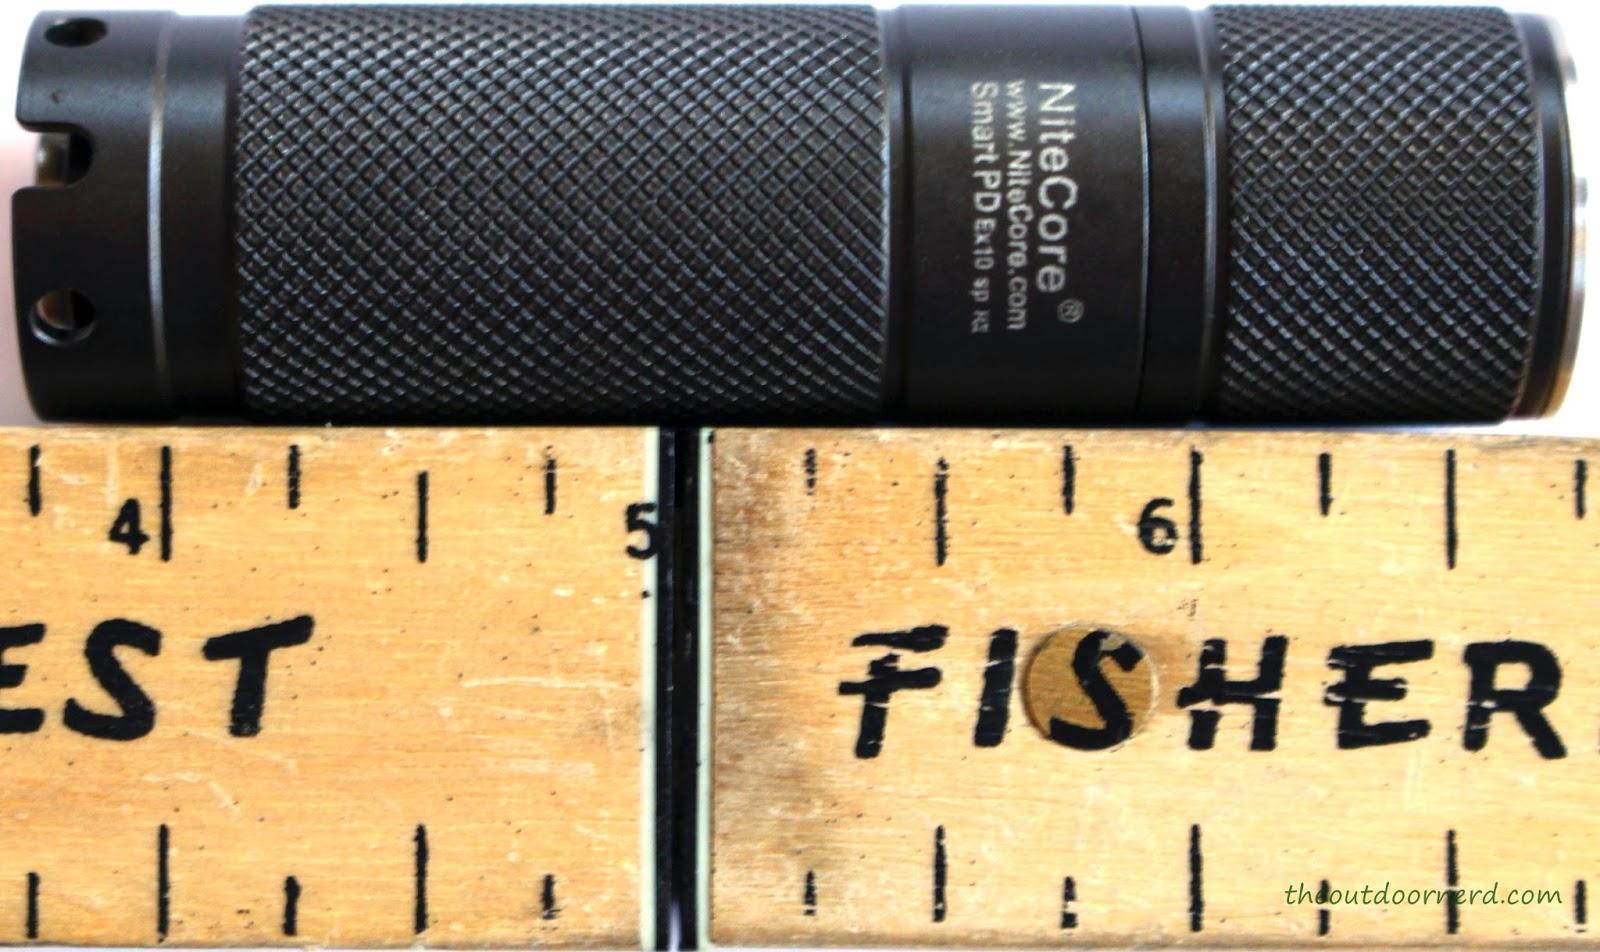 Nitecore Ex10 1xCR123A Flashlight Next To Ruler